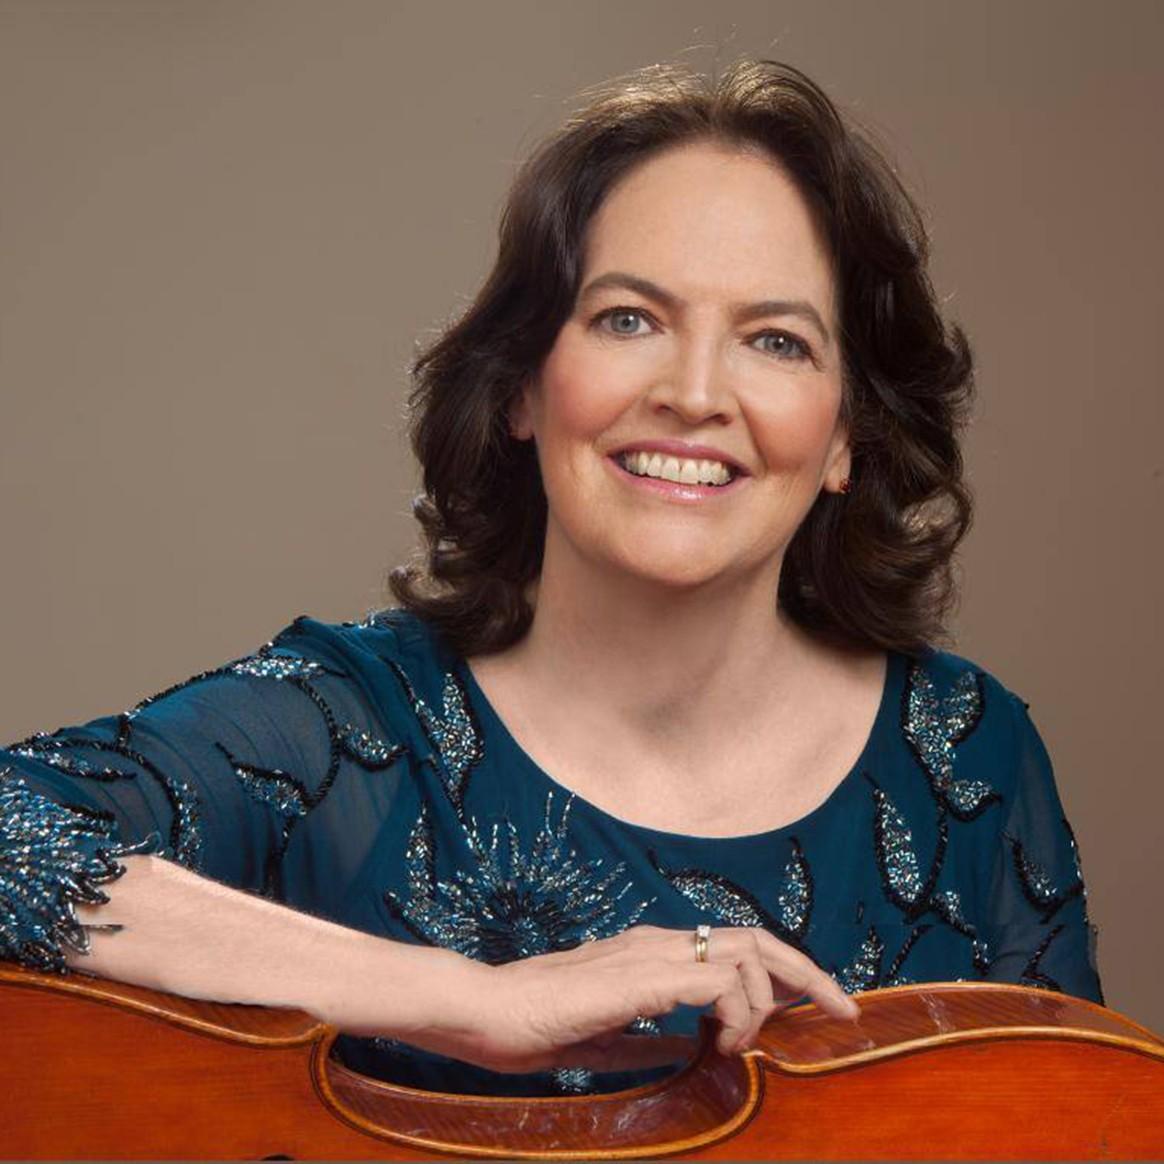 Headshot of Penn State Professor of Cello Kim Cook